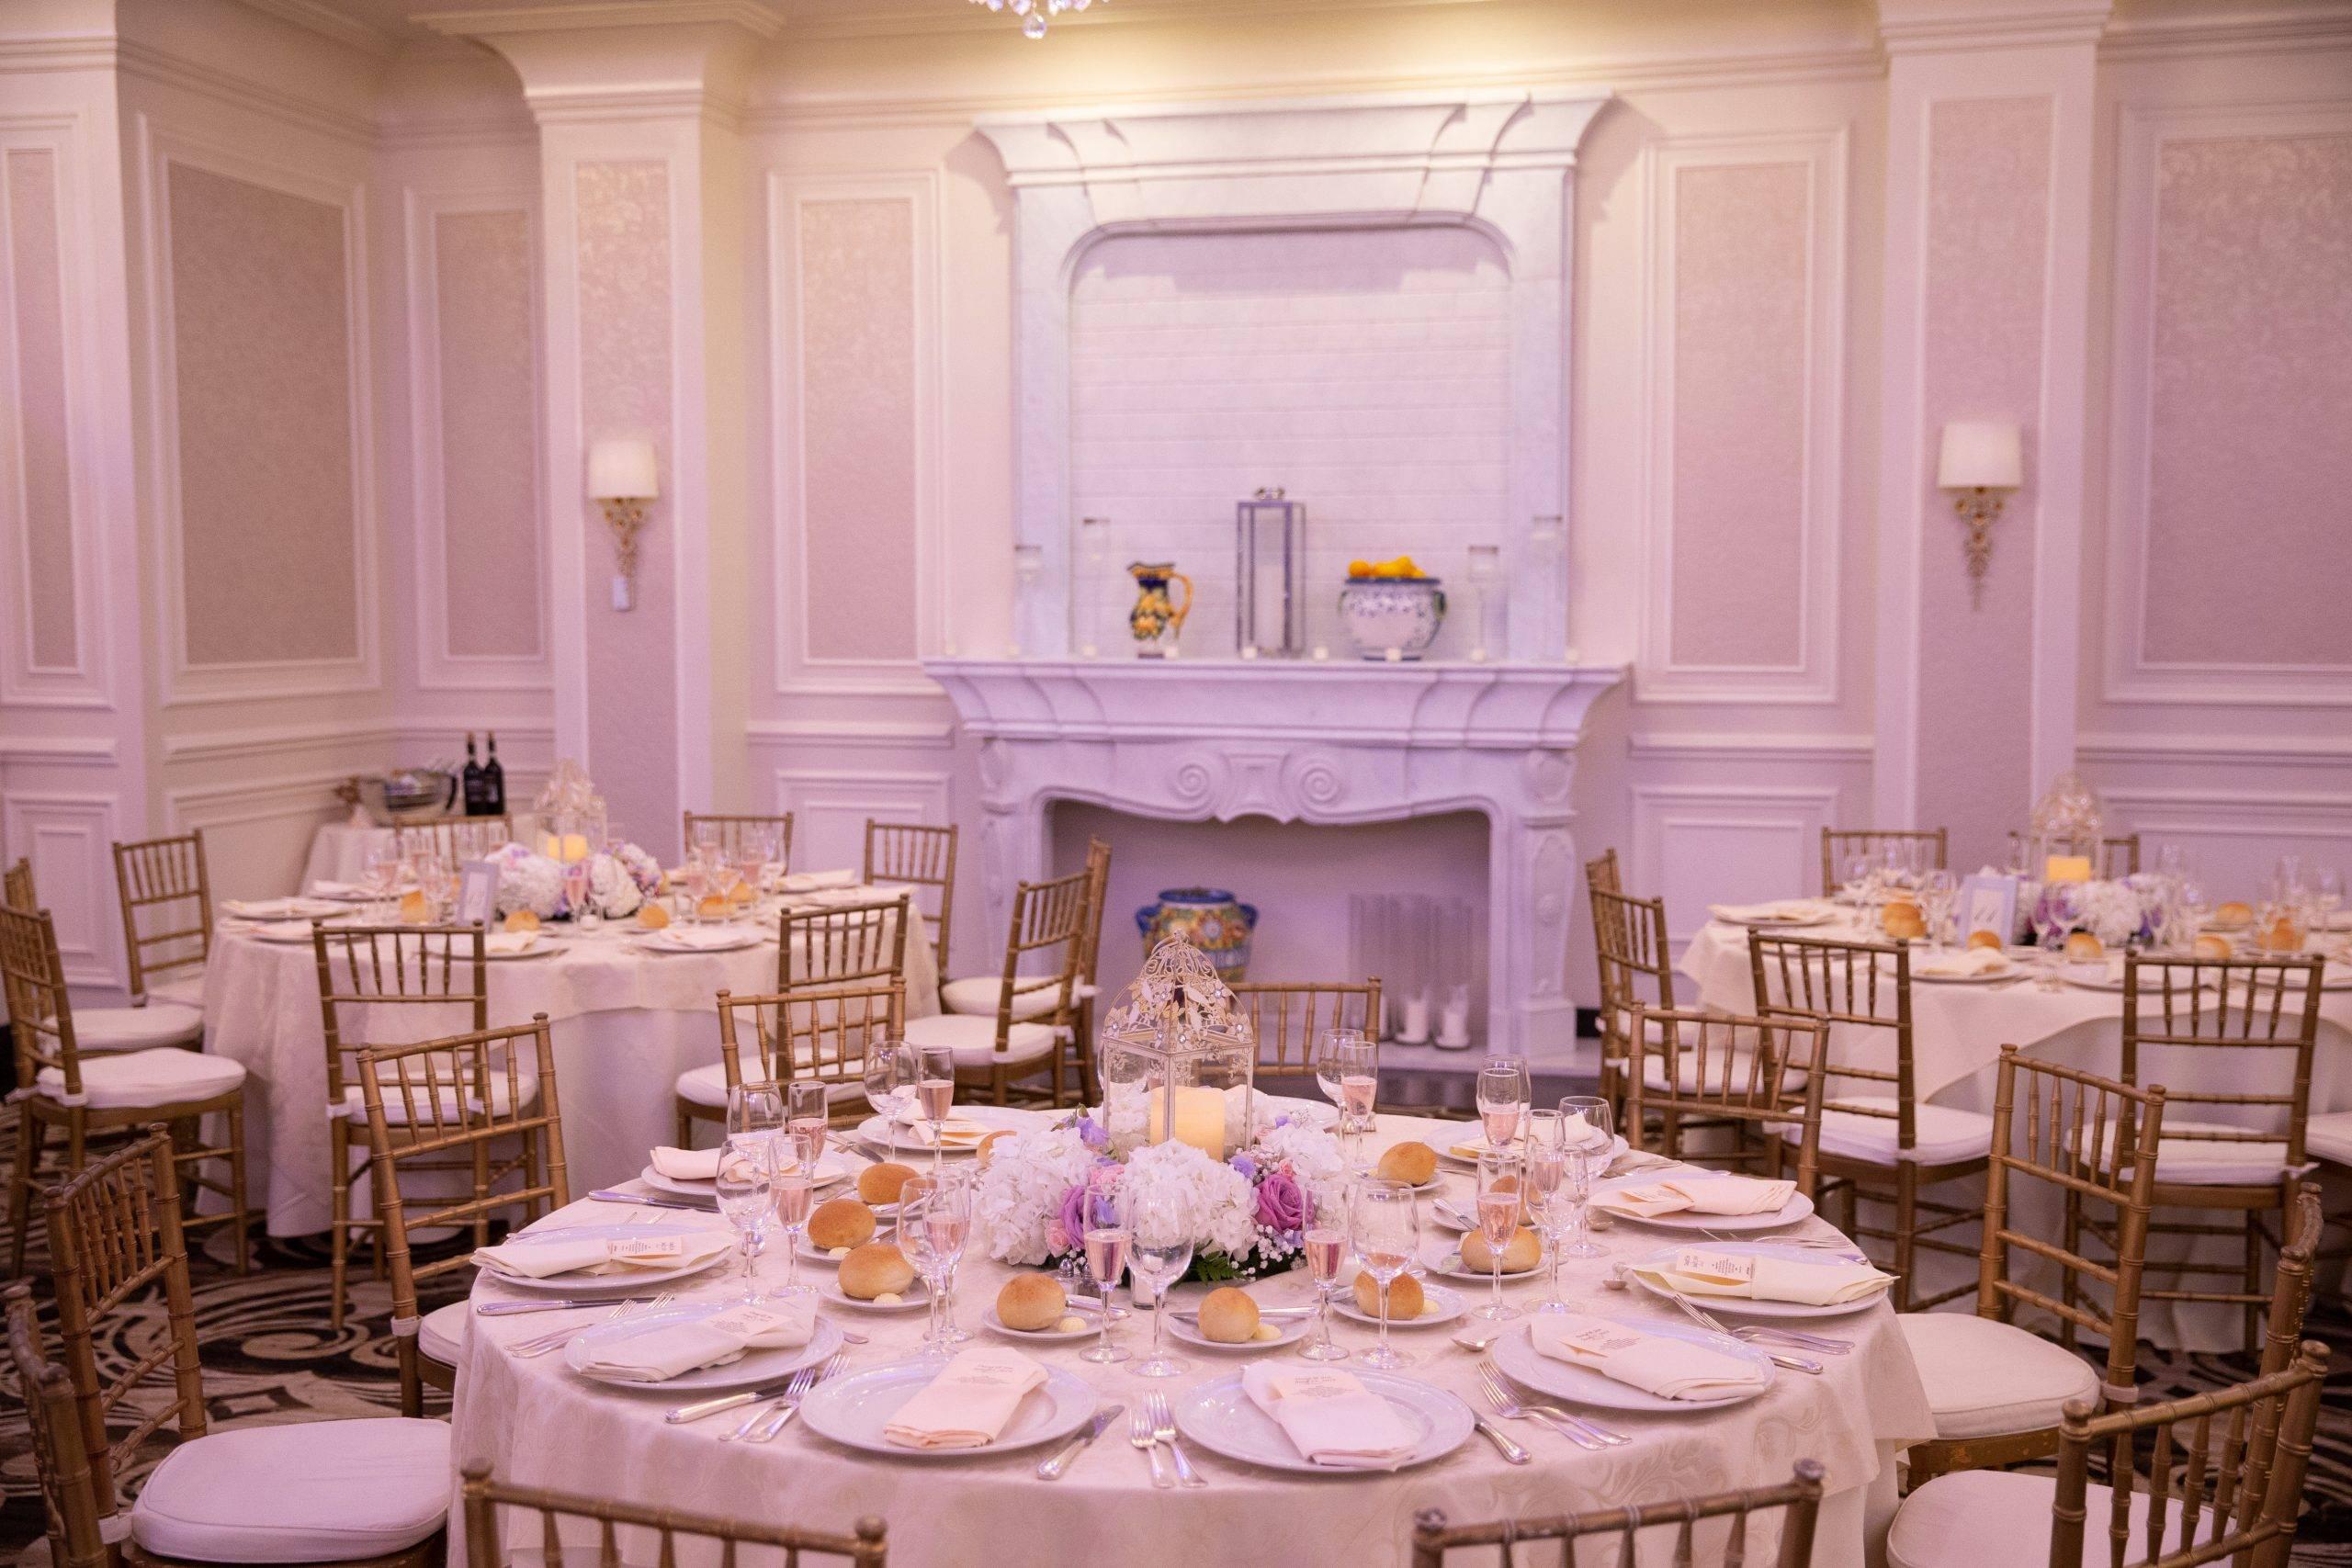 Meadow Wood wedding table setting